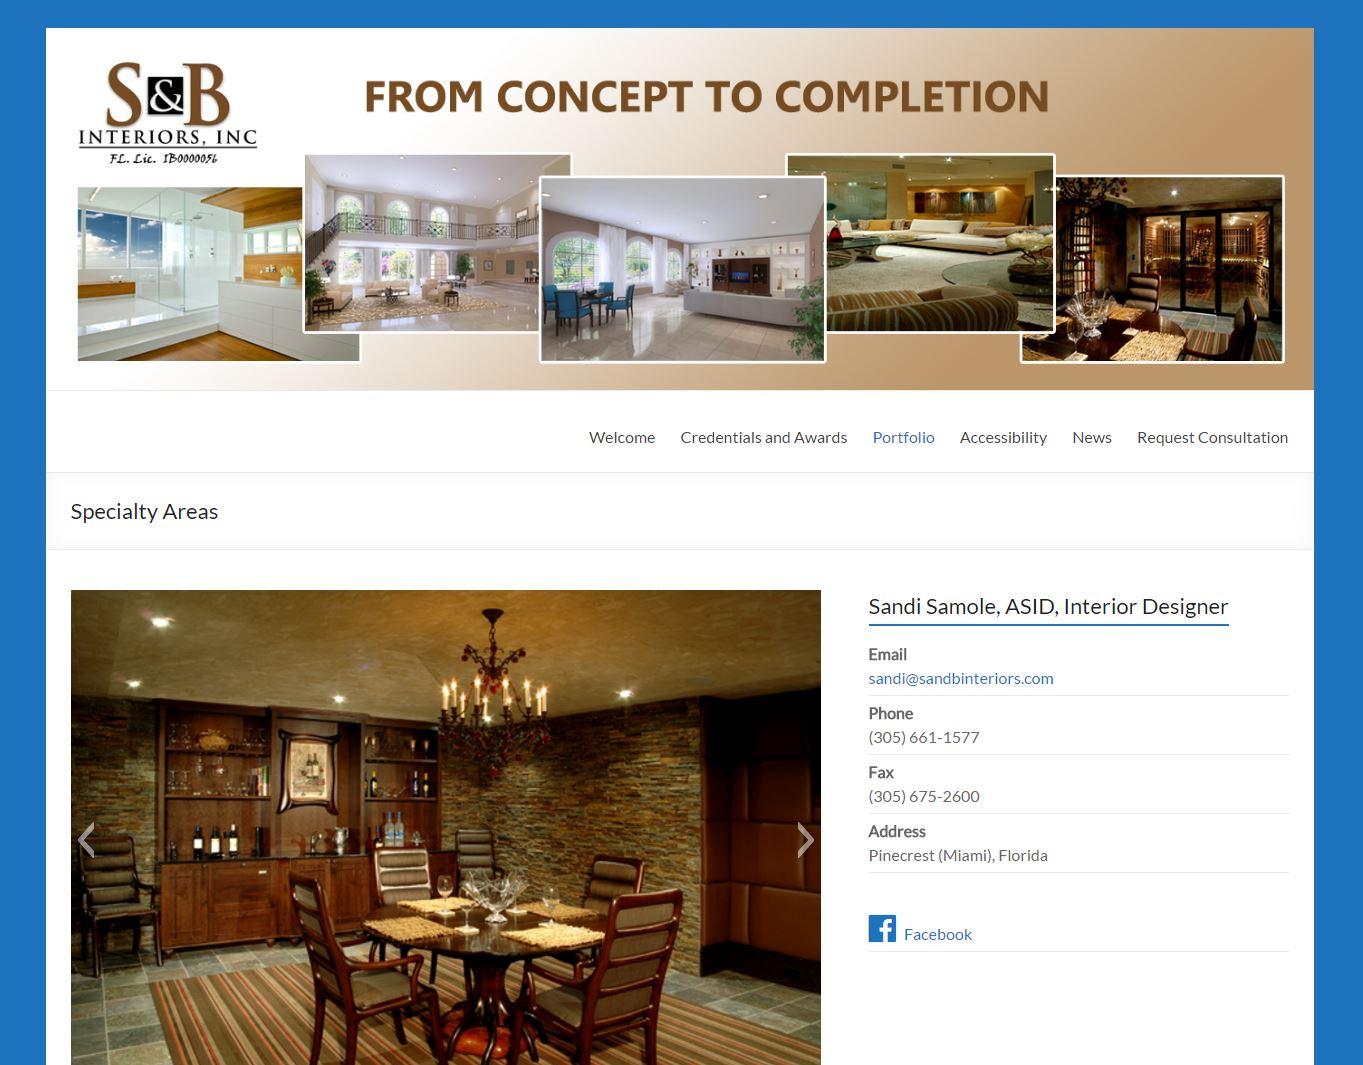 S & B Interiors, Inc.